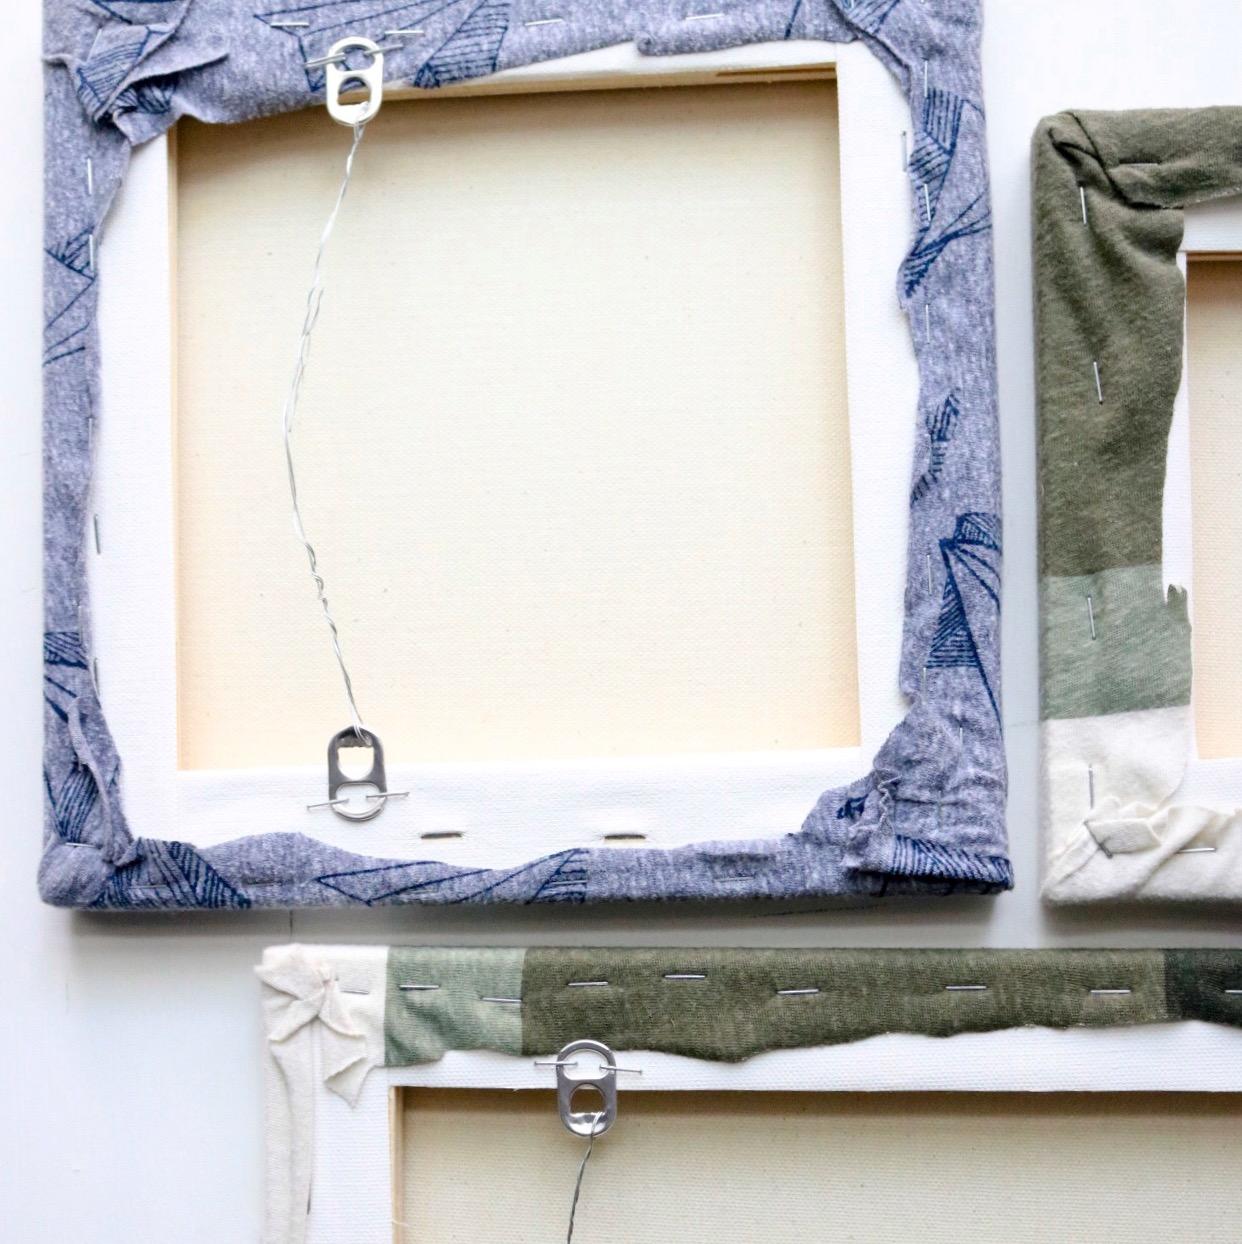 DIY T-Shirt Canvas Art    #upcycle     #tshirt     #tshirtdiy     #wallart    #oldshirts #walldecor #thrifty #craftylumberjacks #easydiy #wallart #hangingwallart #apartmentliving #tshirtcraft #oldtshirts #canvasart